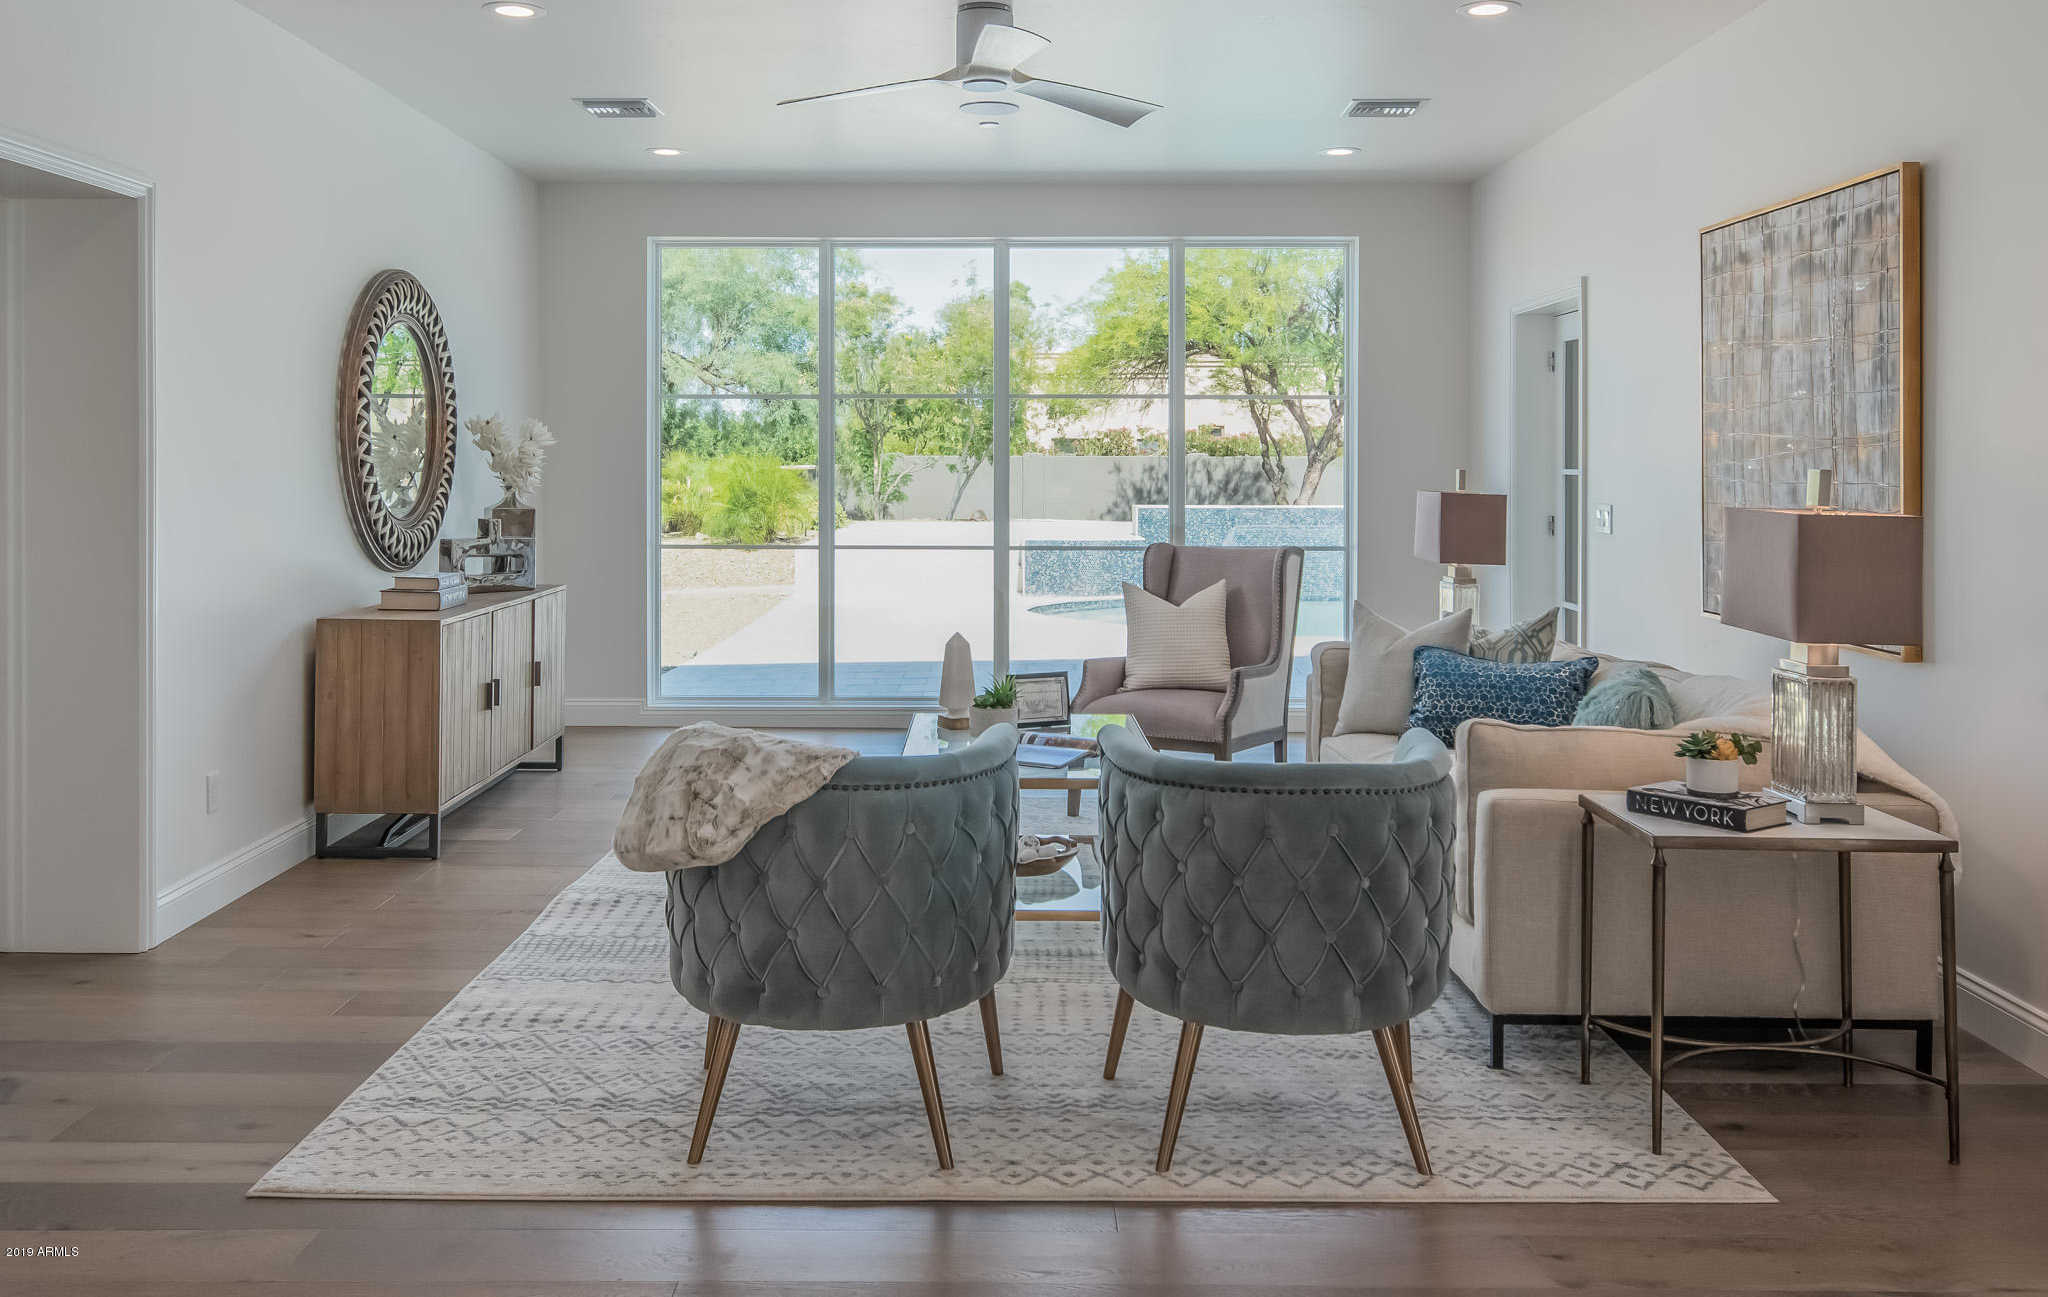 $2,300,000 - 5Br/7Ba - Home for Sale in Mockingbird Lane Estates, Paradise Valley